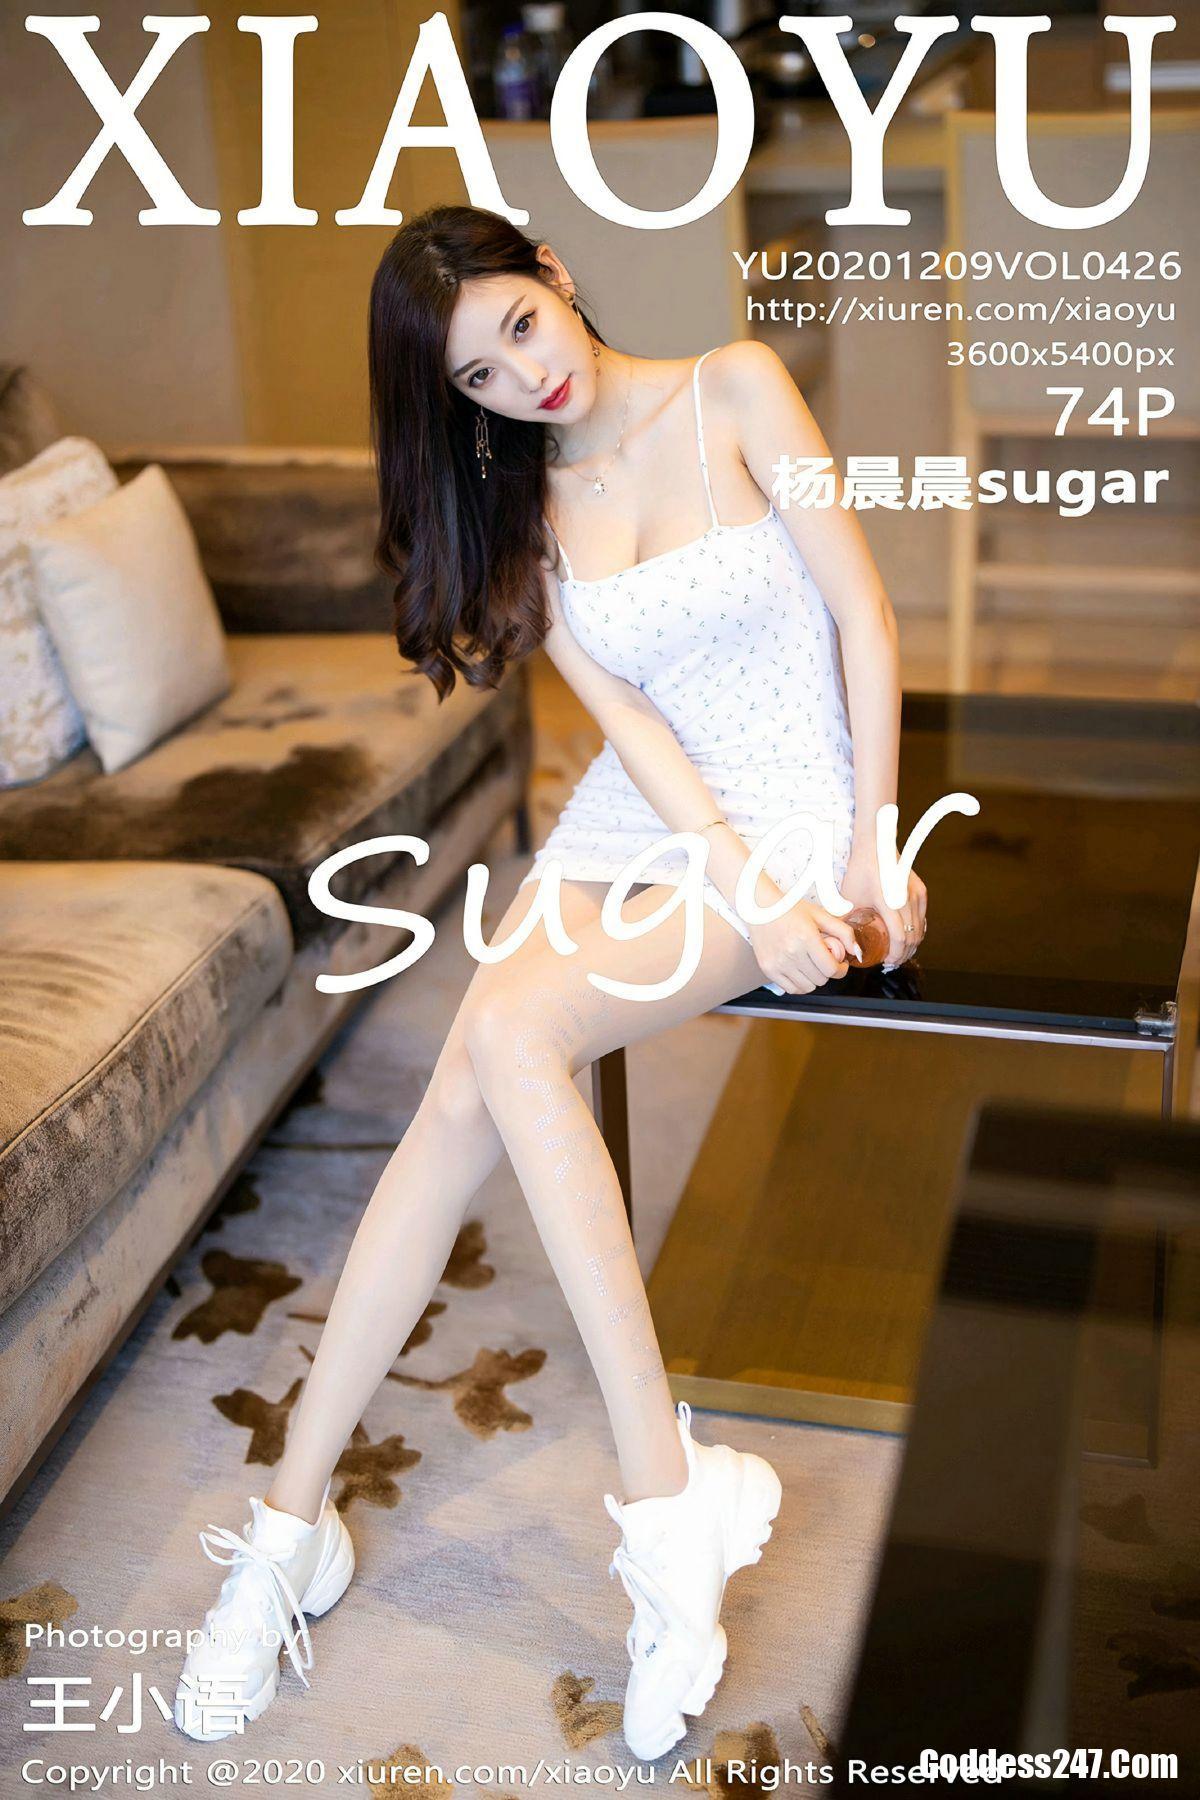 XiaoYu语画界 Vol.426 杨晨晨sugar